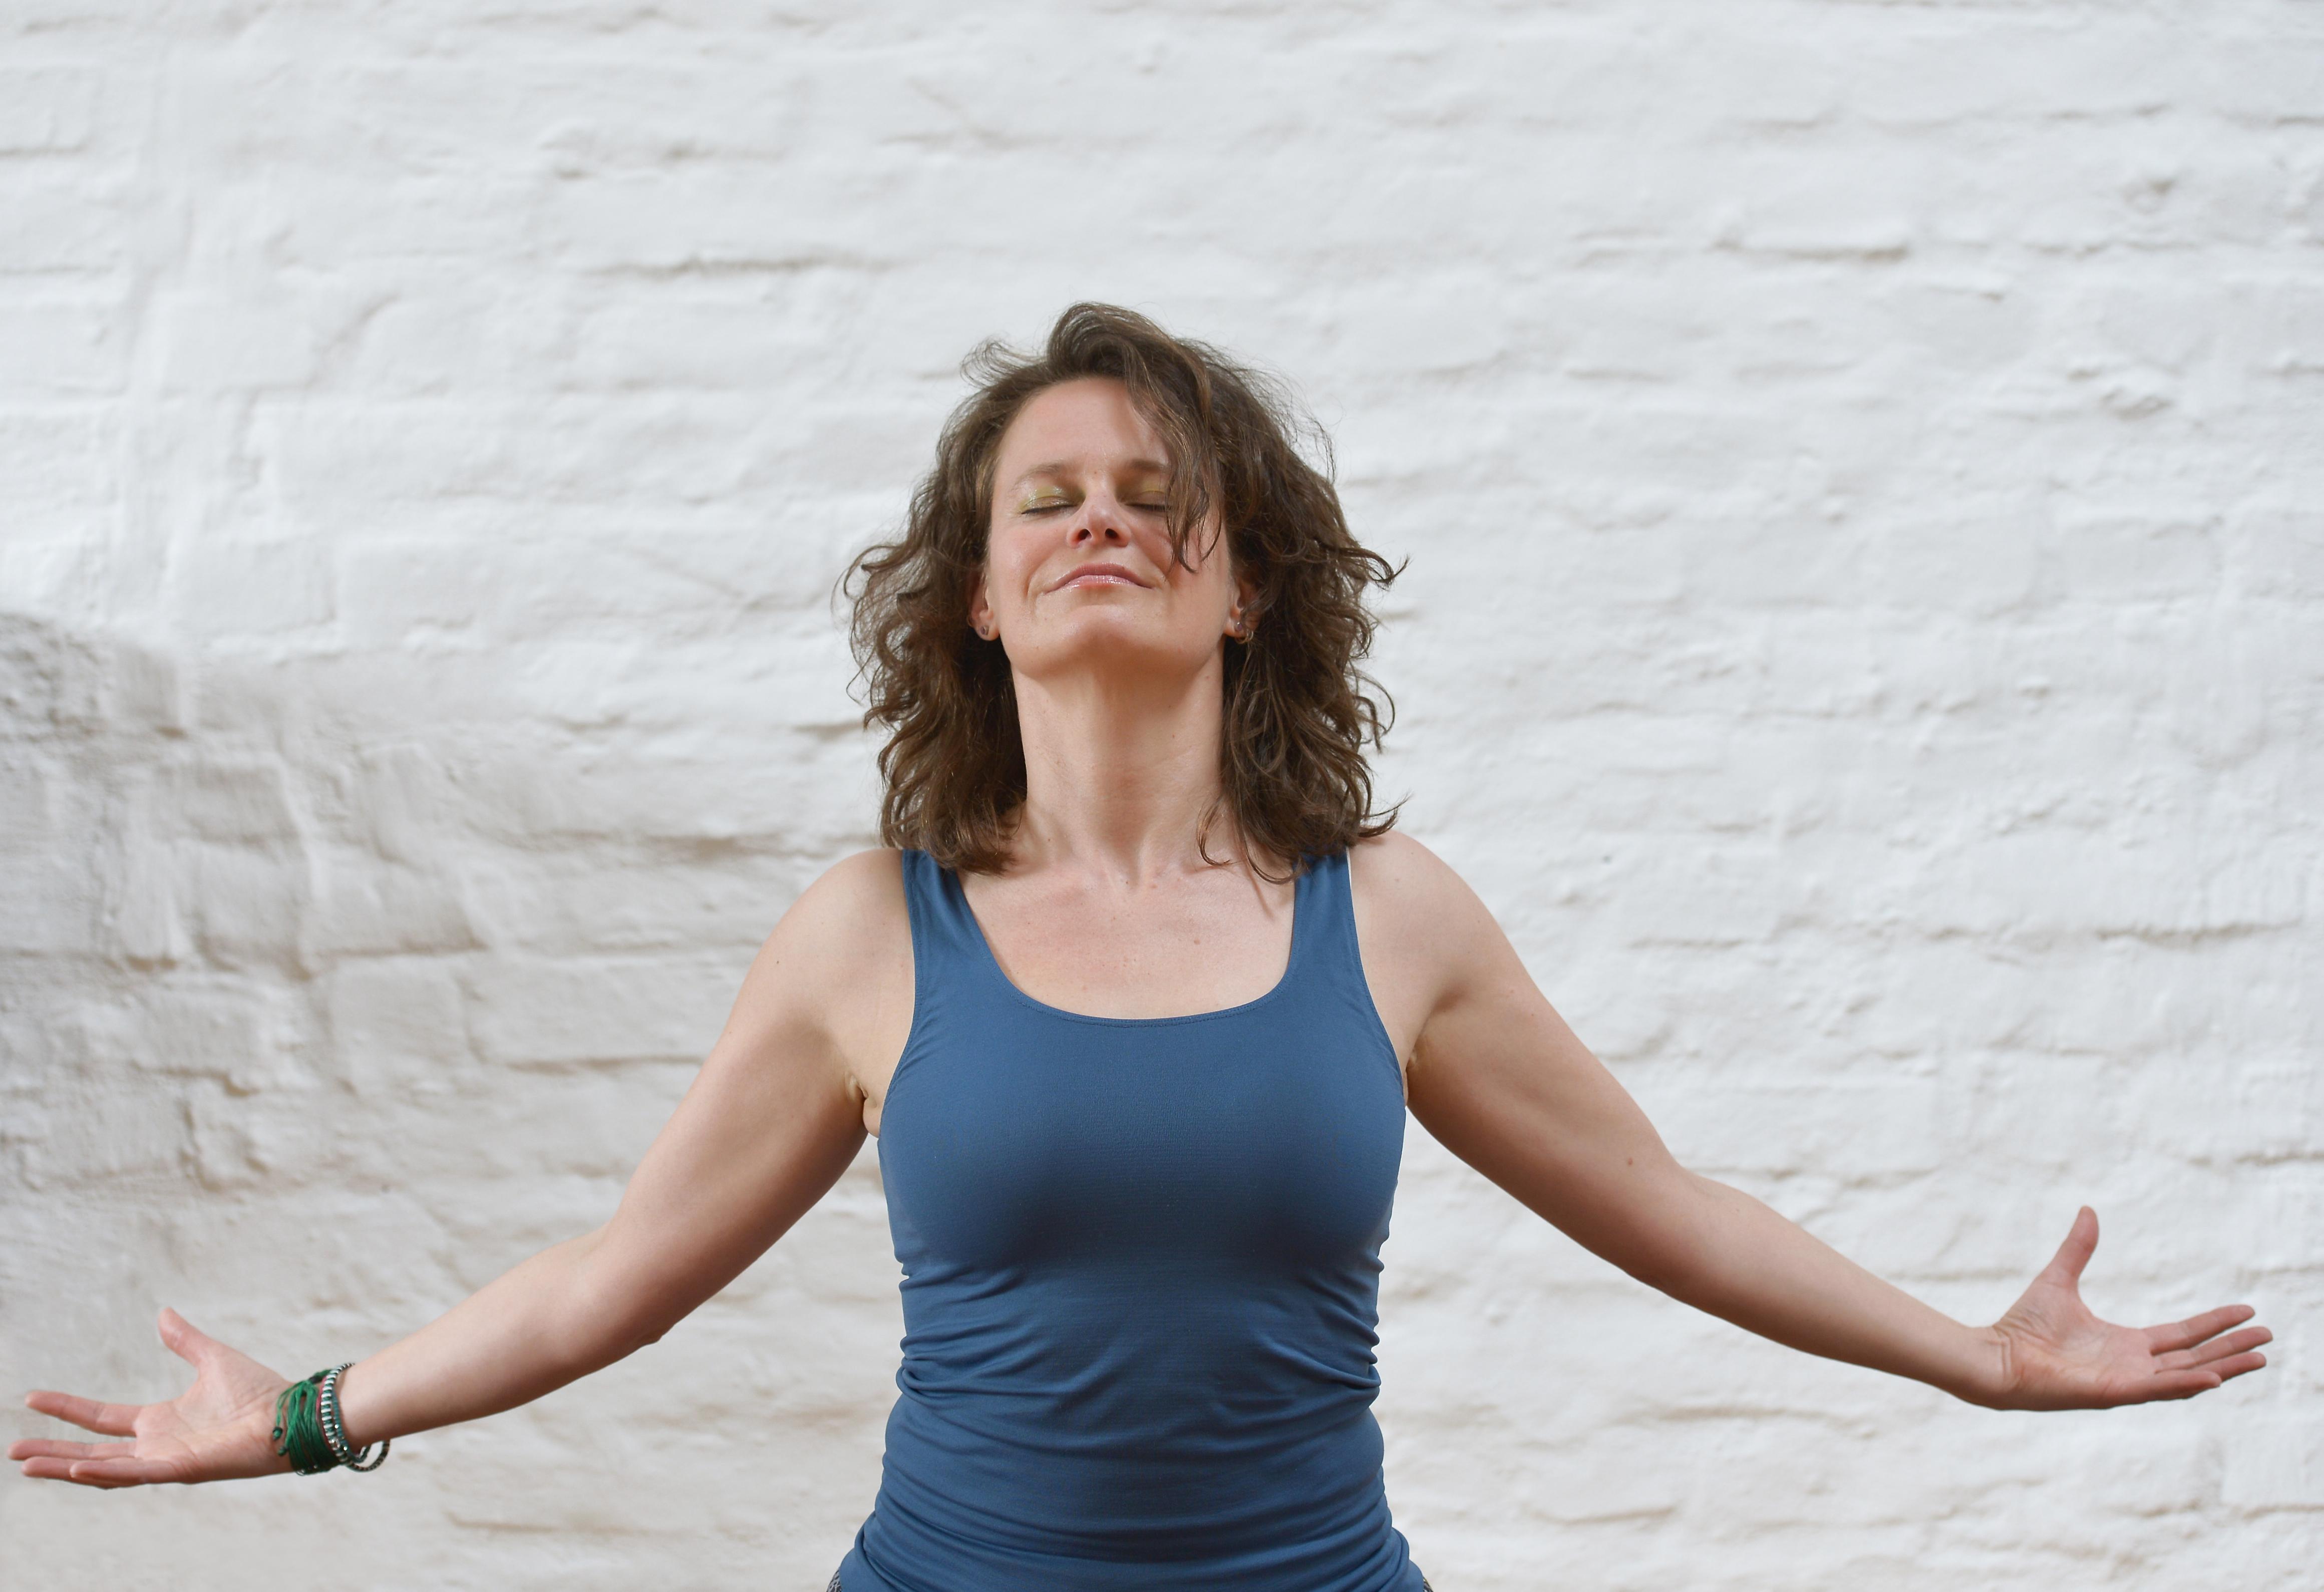 everybodyoga Yoga Kundalini Yoga content